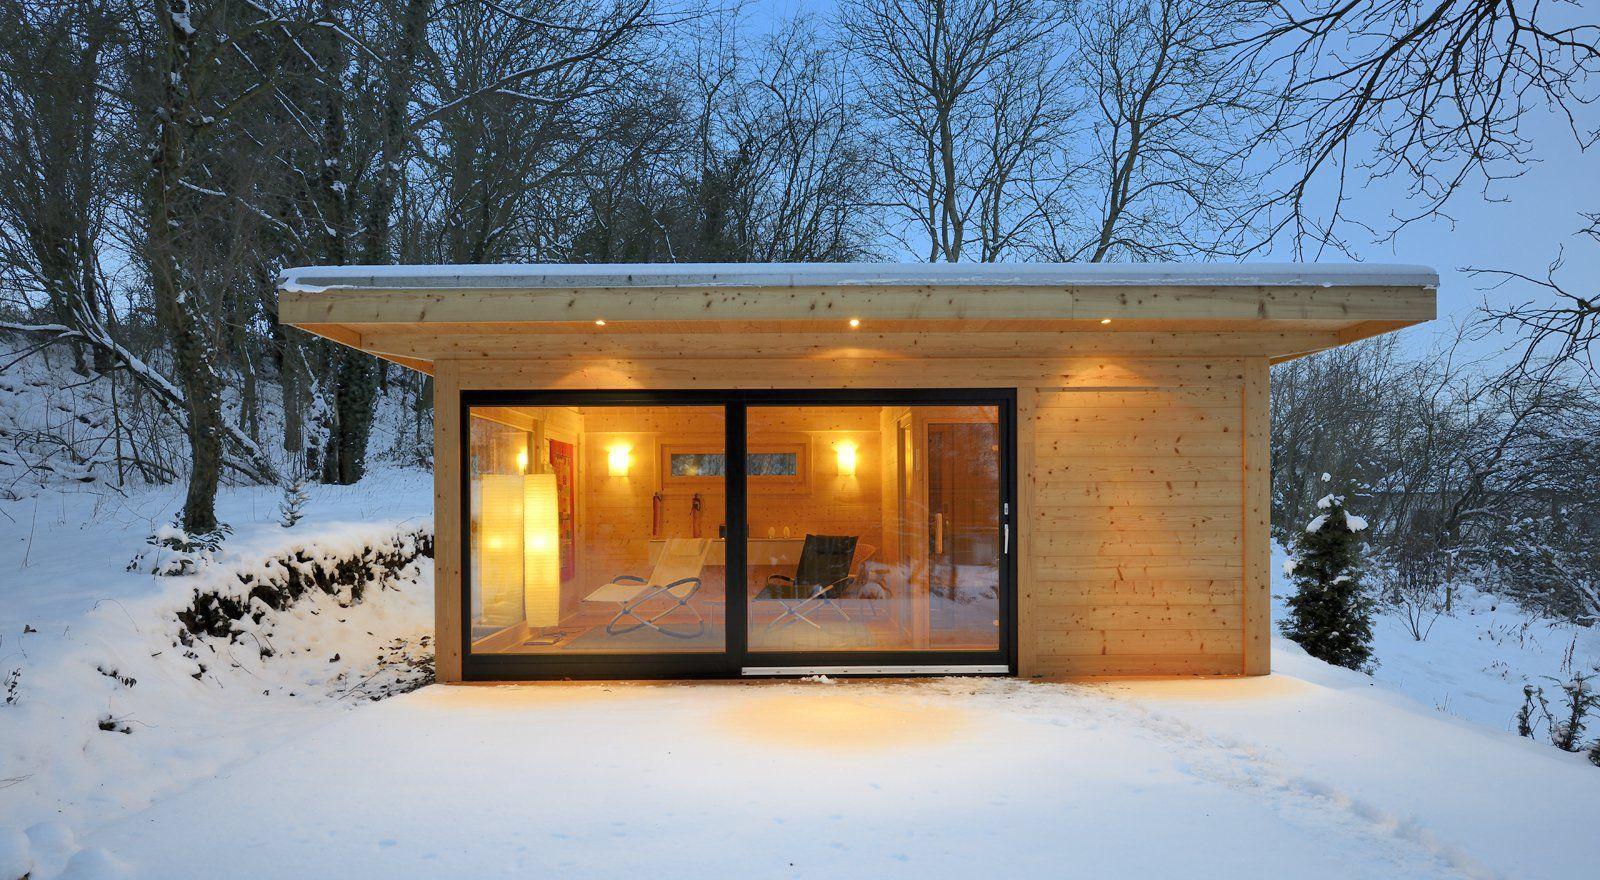 hummel blockhaus gartenh user pavillons whirlpoolh user saunah user gartenlounges. Black Bedroom Furniture Sets. Home Design Ideas